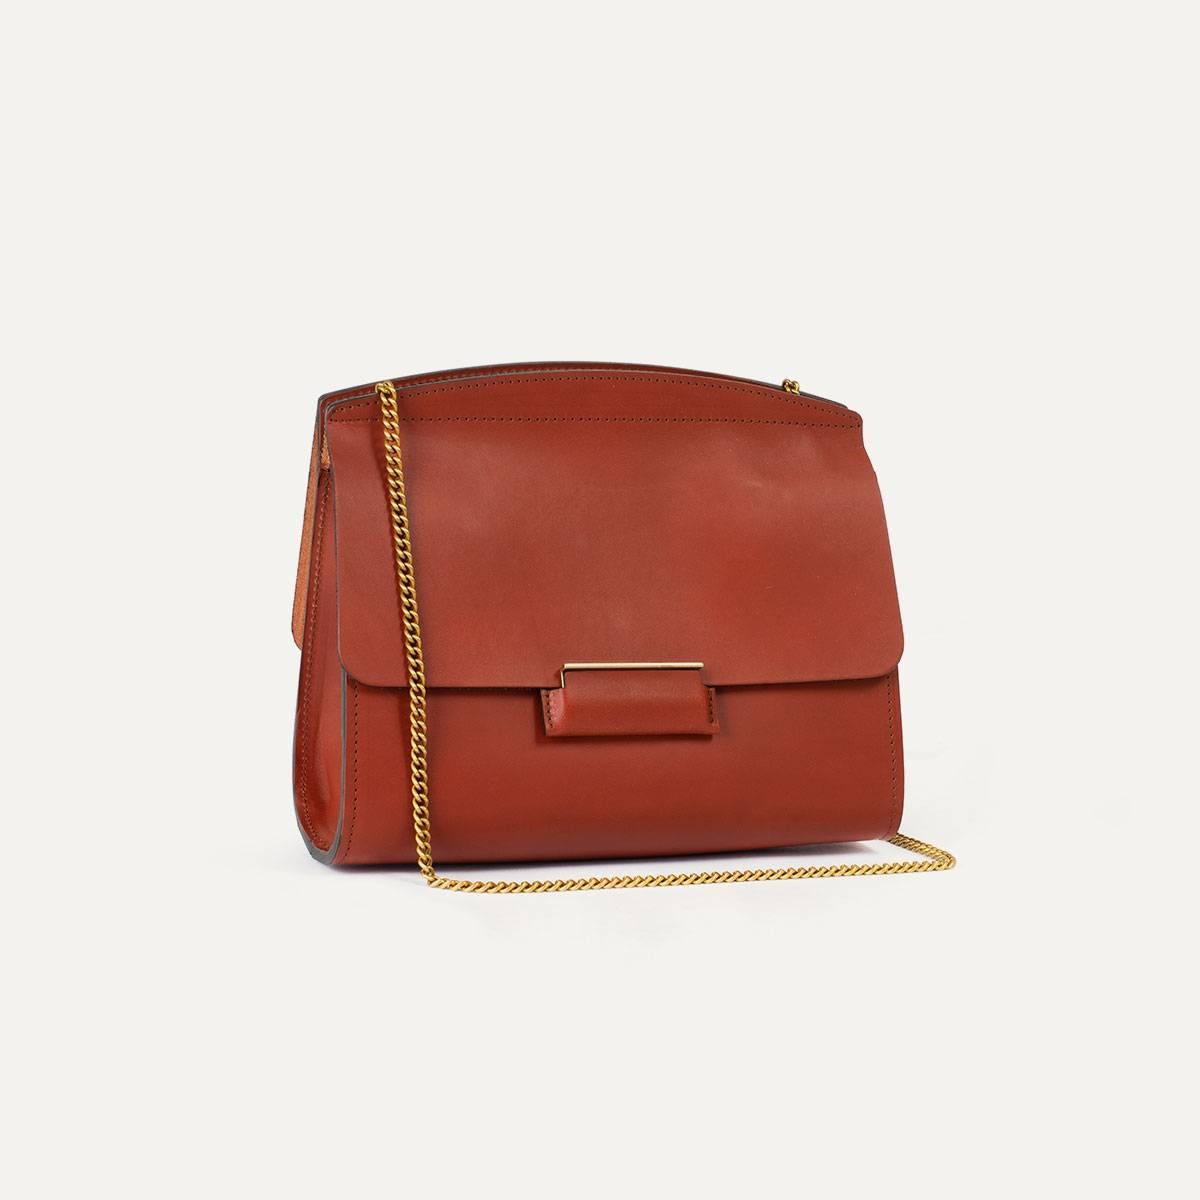 Origami S clutch bag - Rust (image n°6)